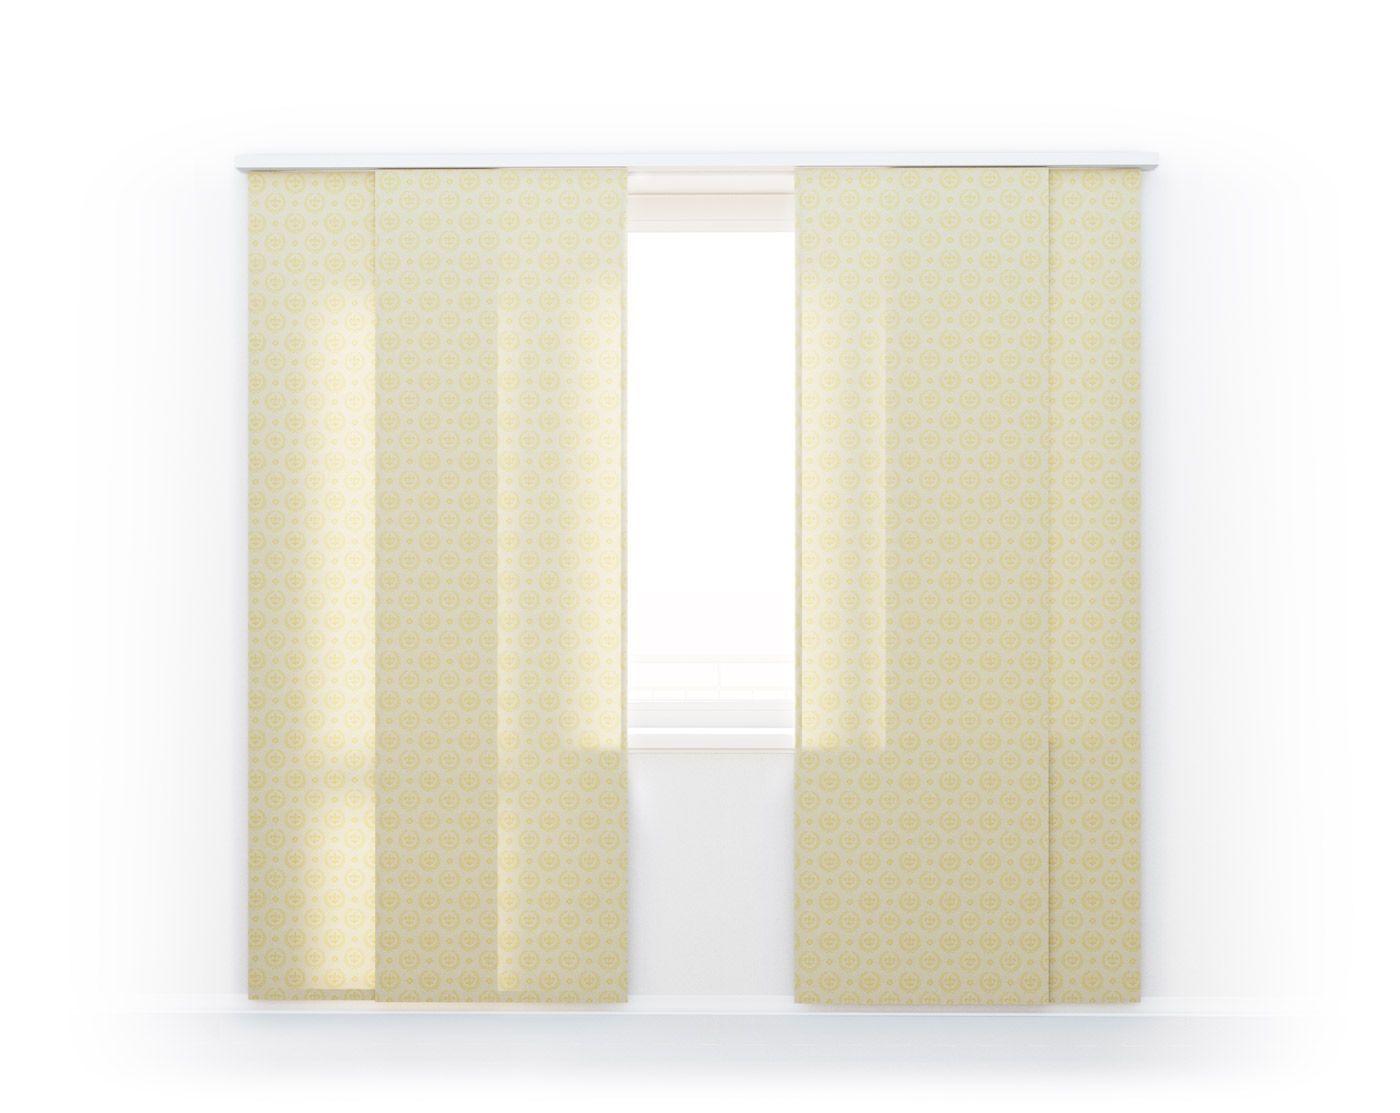 Японские шторы Louis D'or, 2382/24